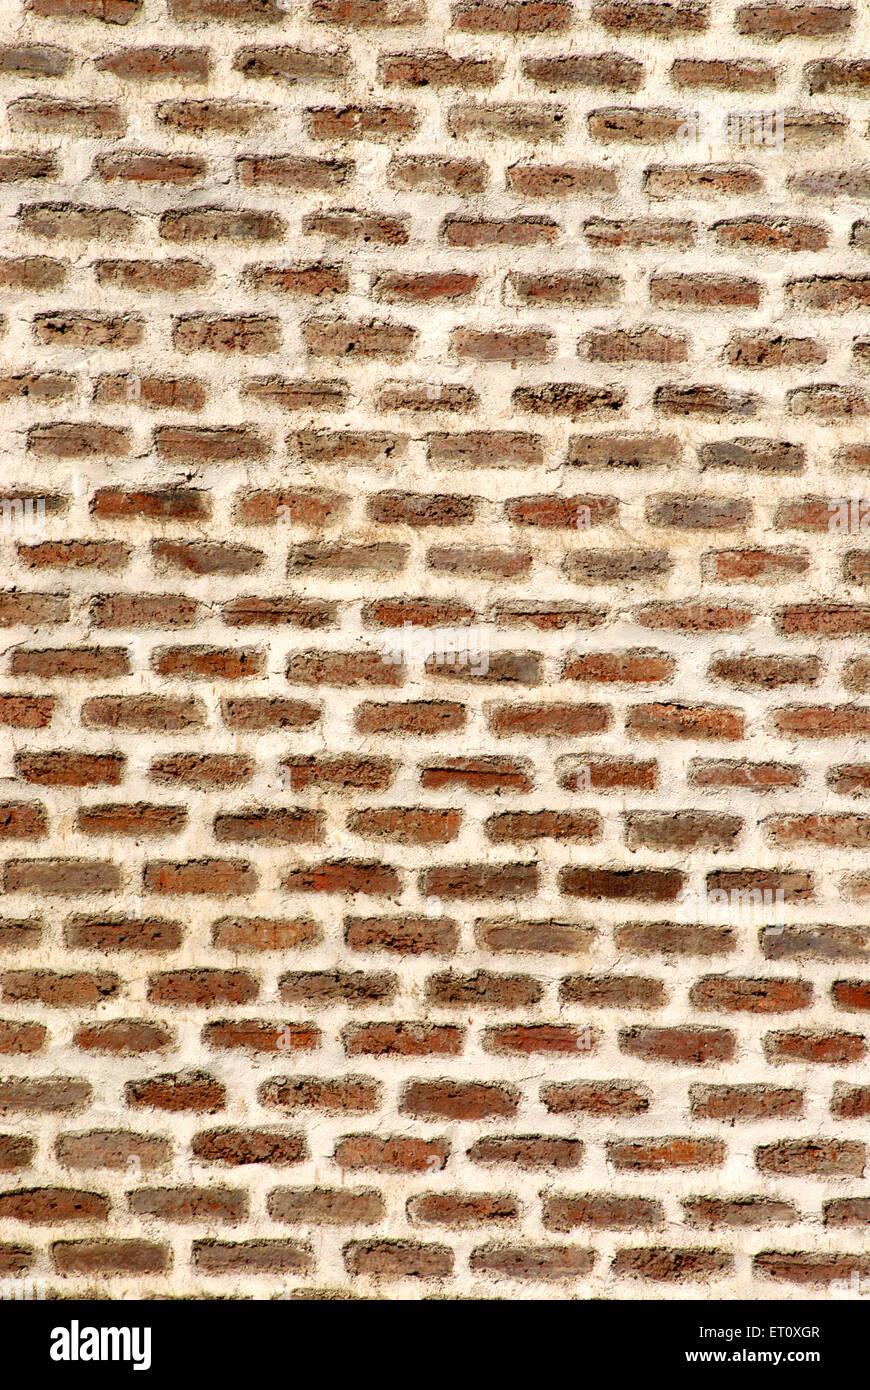 Neat and clean brickwork of external wall of Vishrambaug Wada second palace of Peshve the Maratha king ; Pune - Stock Image